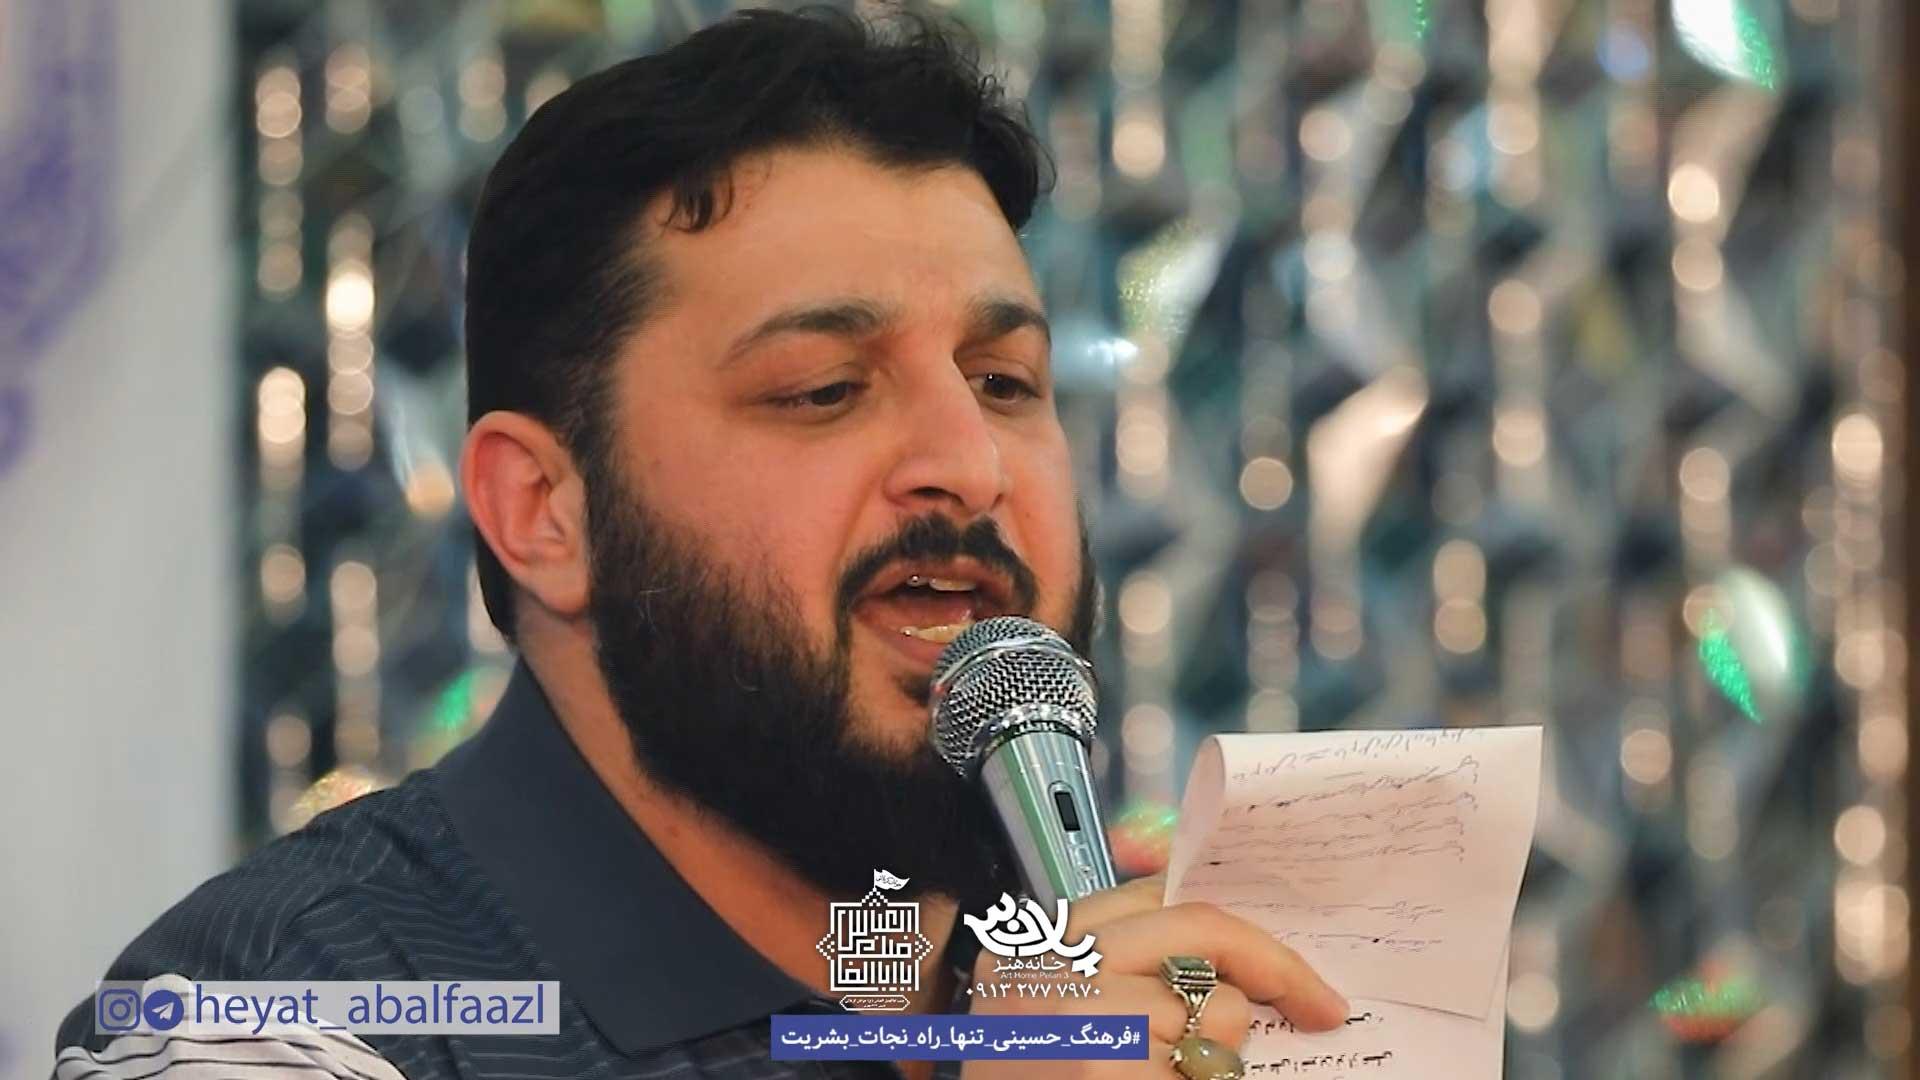 شب-عشق-بیکران-محمود-گرجی